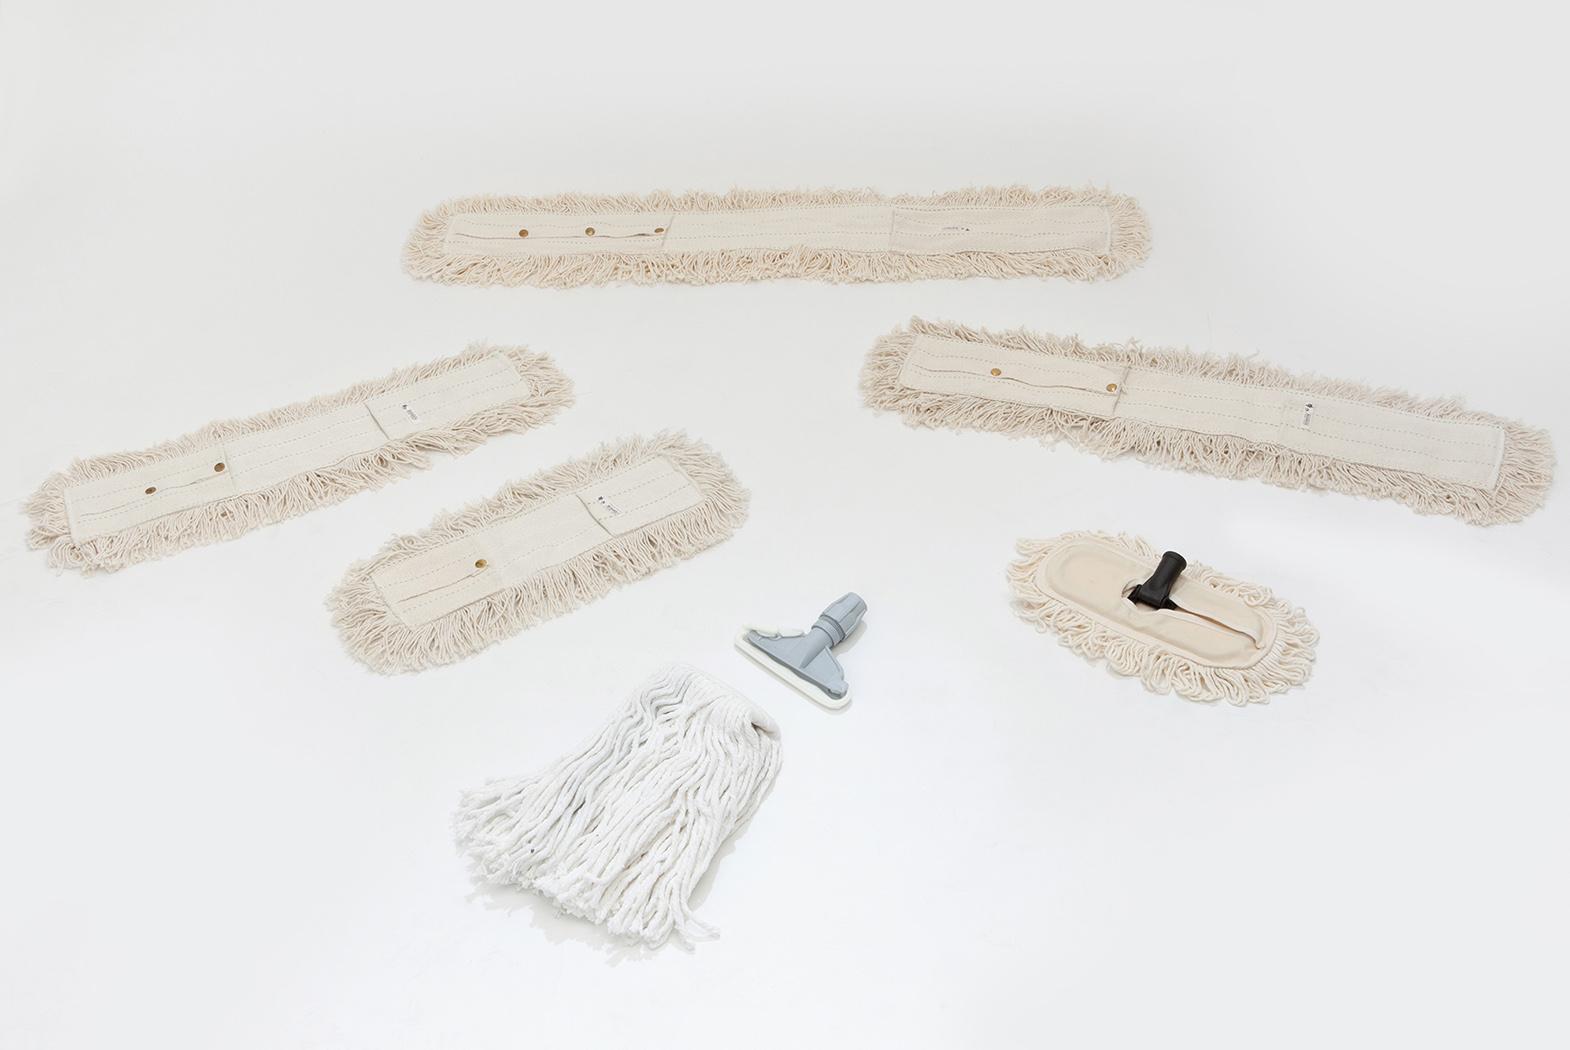 Refills for mops